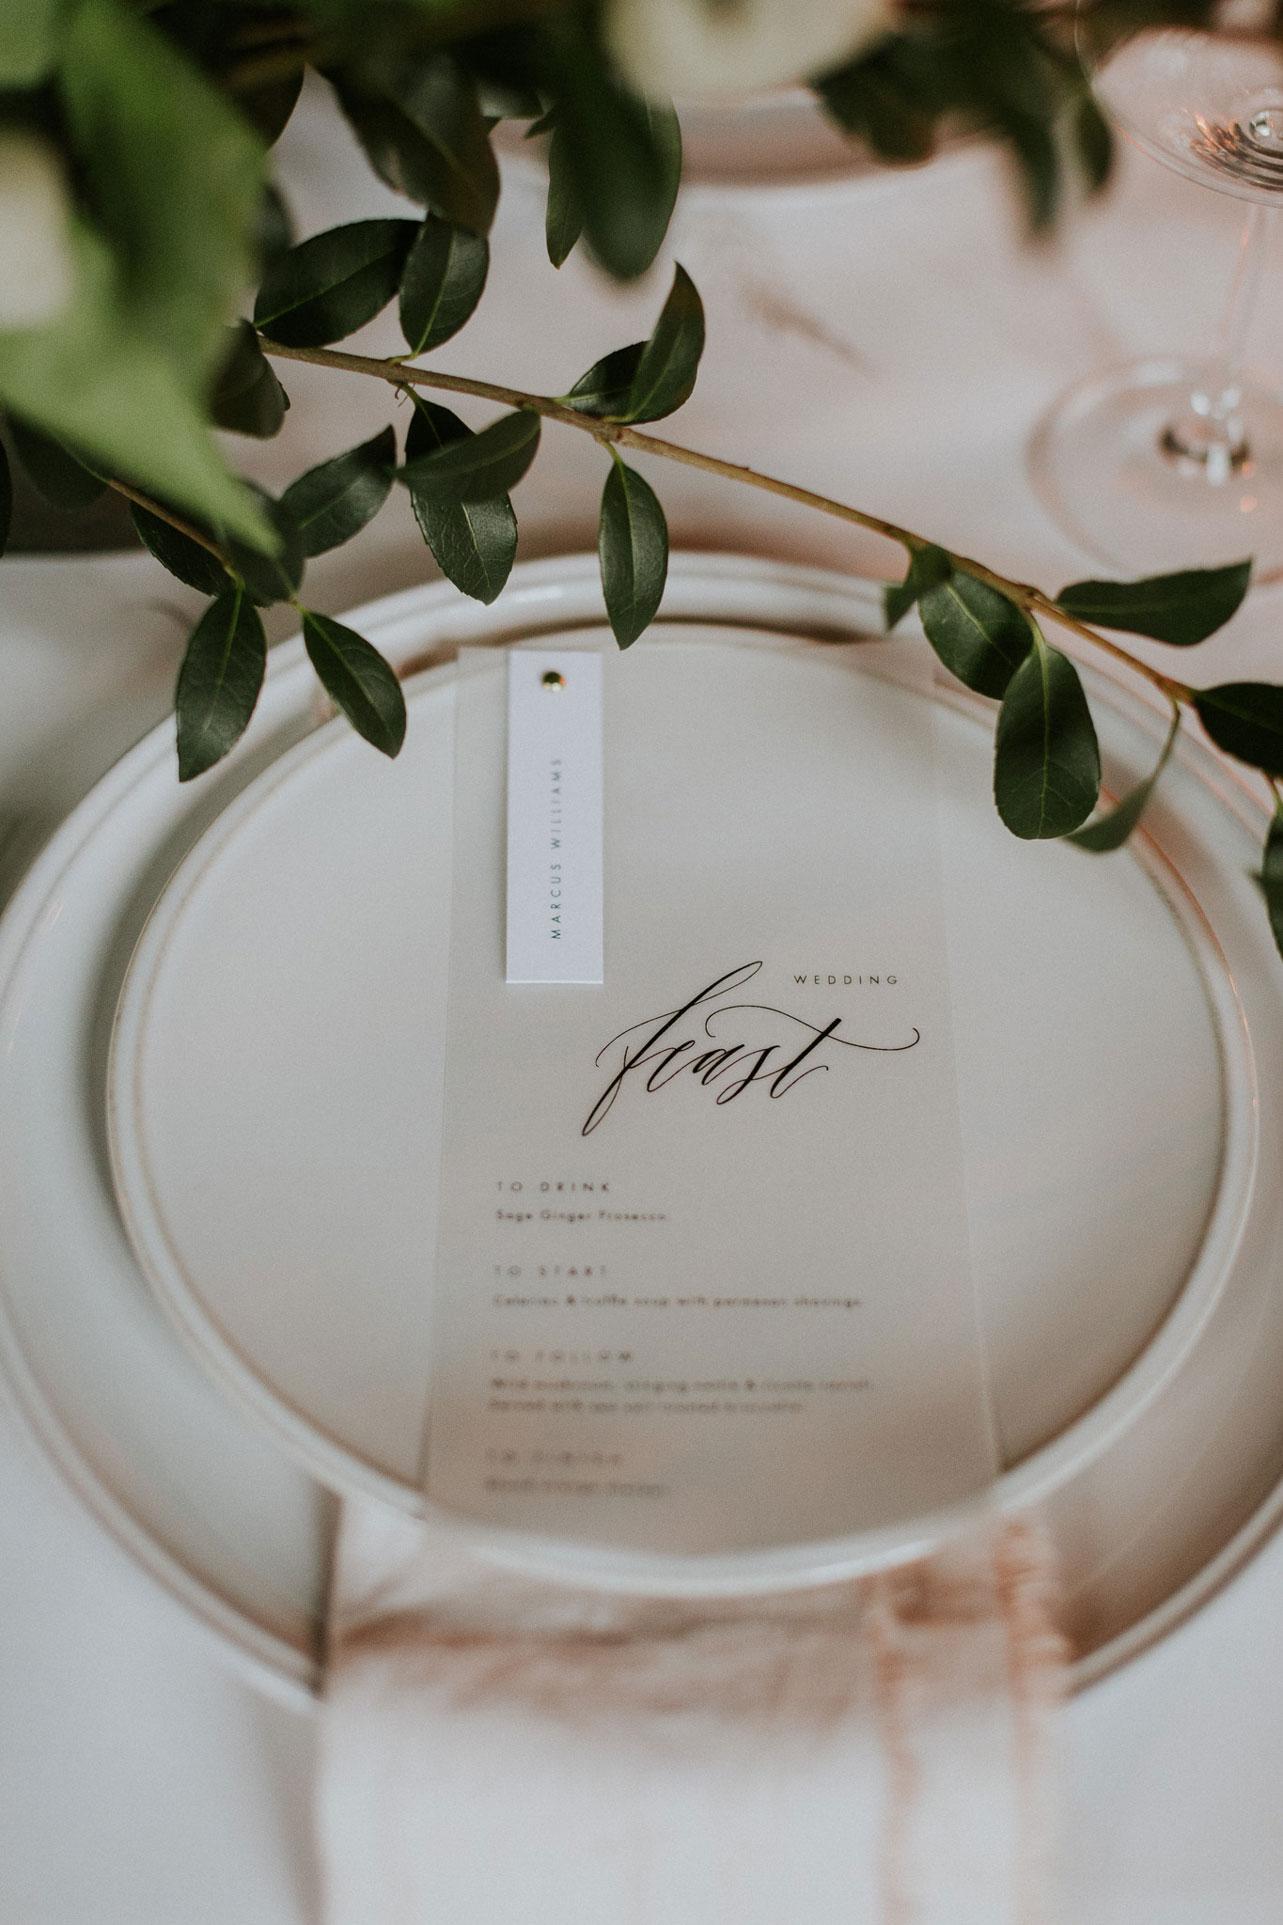 The semi sheer vellum adds a crisp modern feeling to the wedding menus.